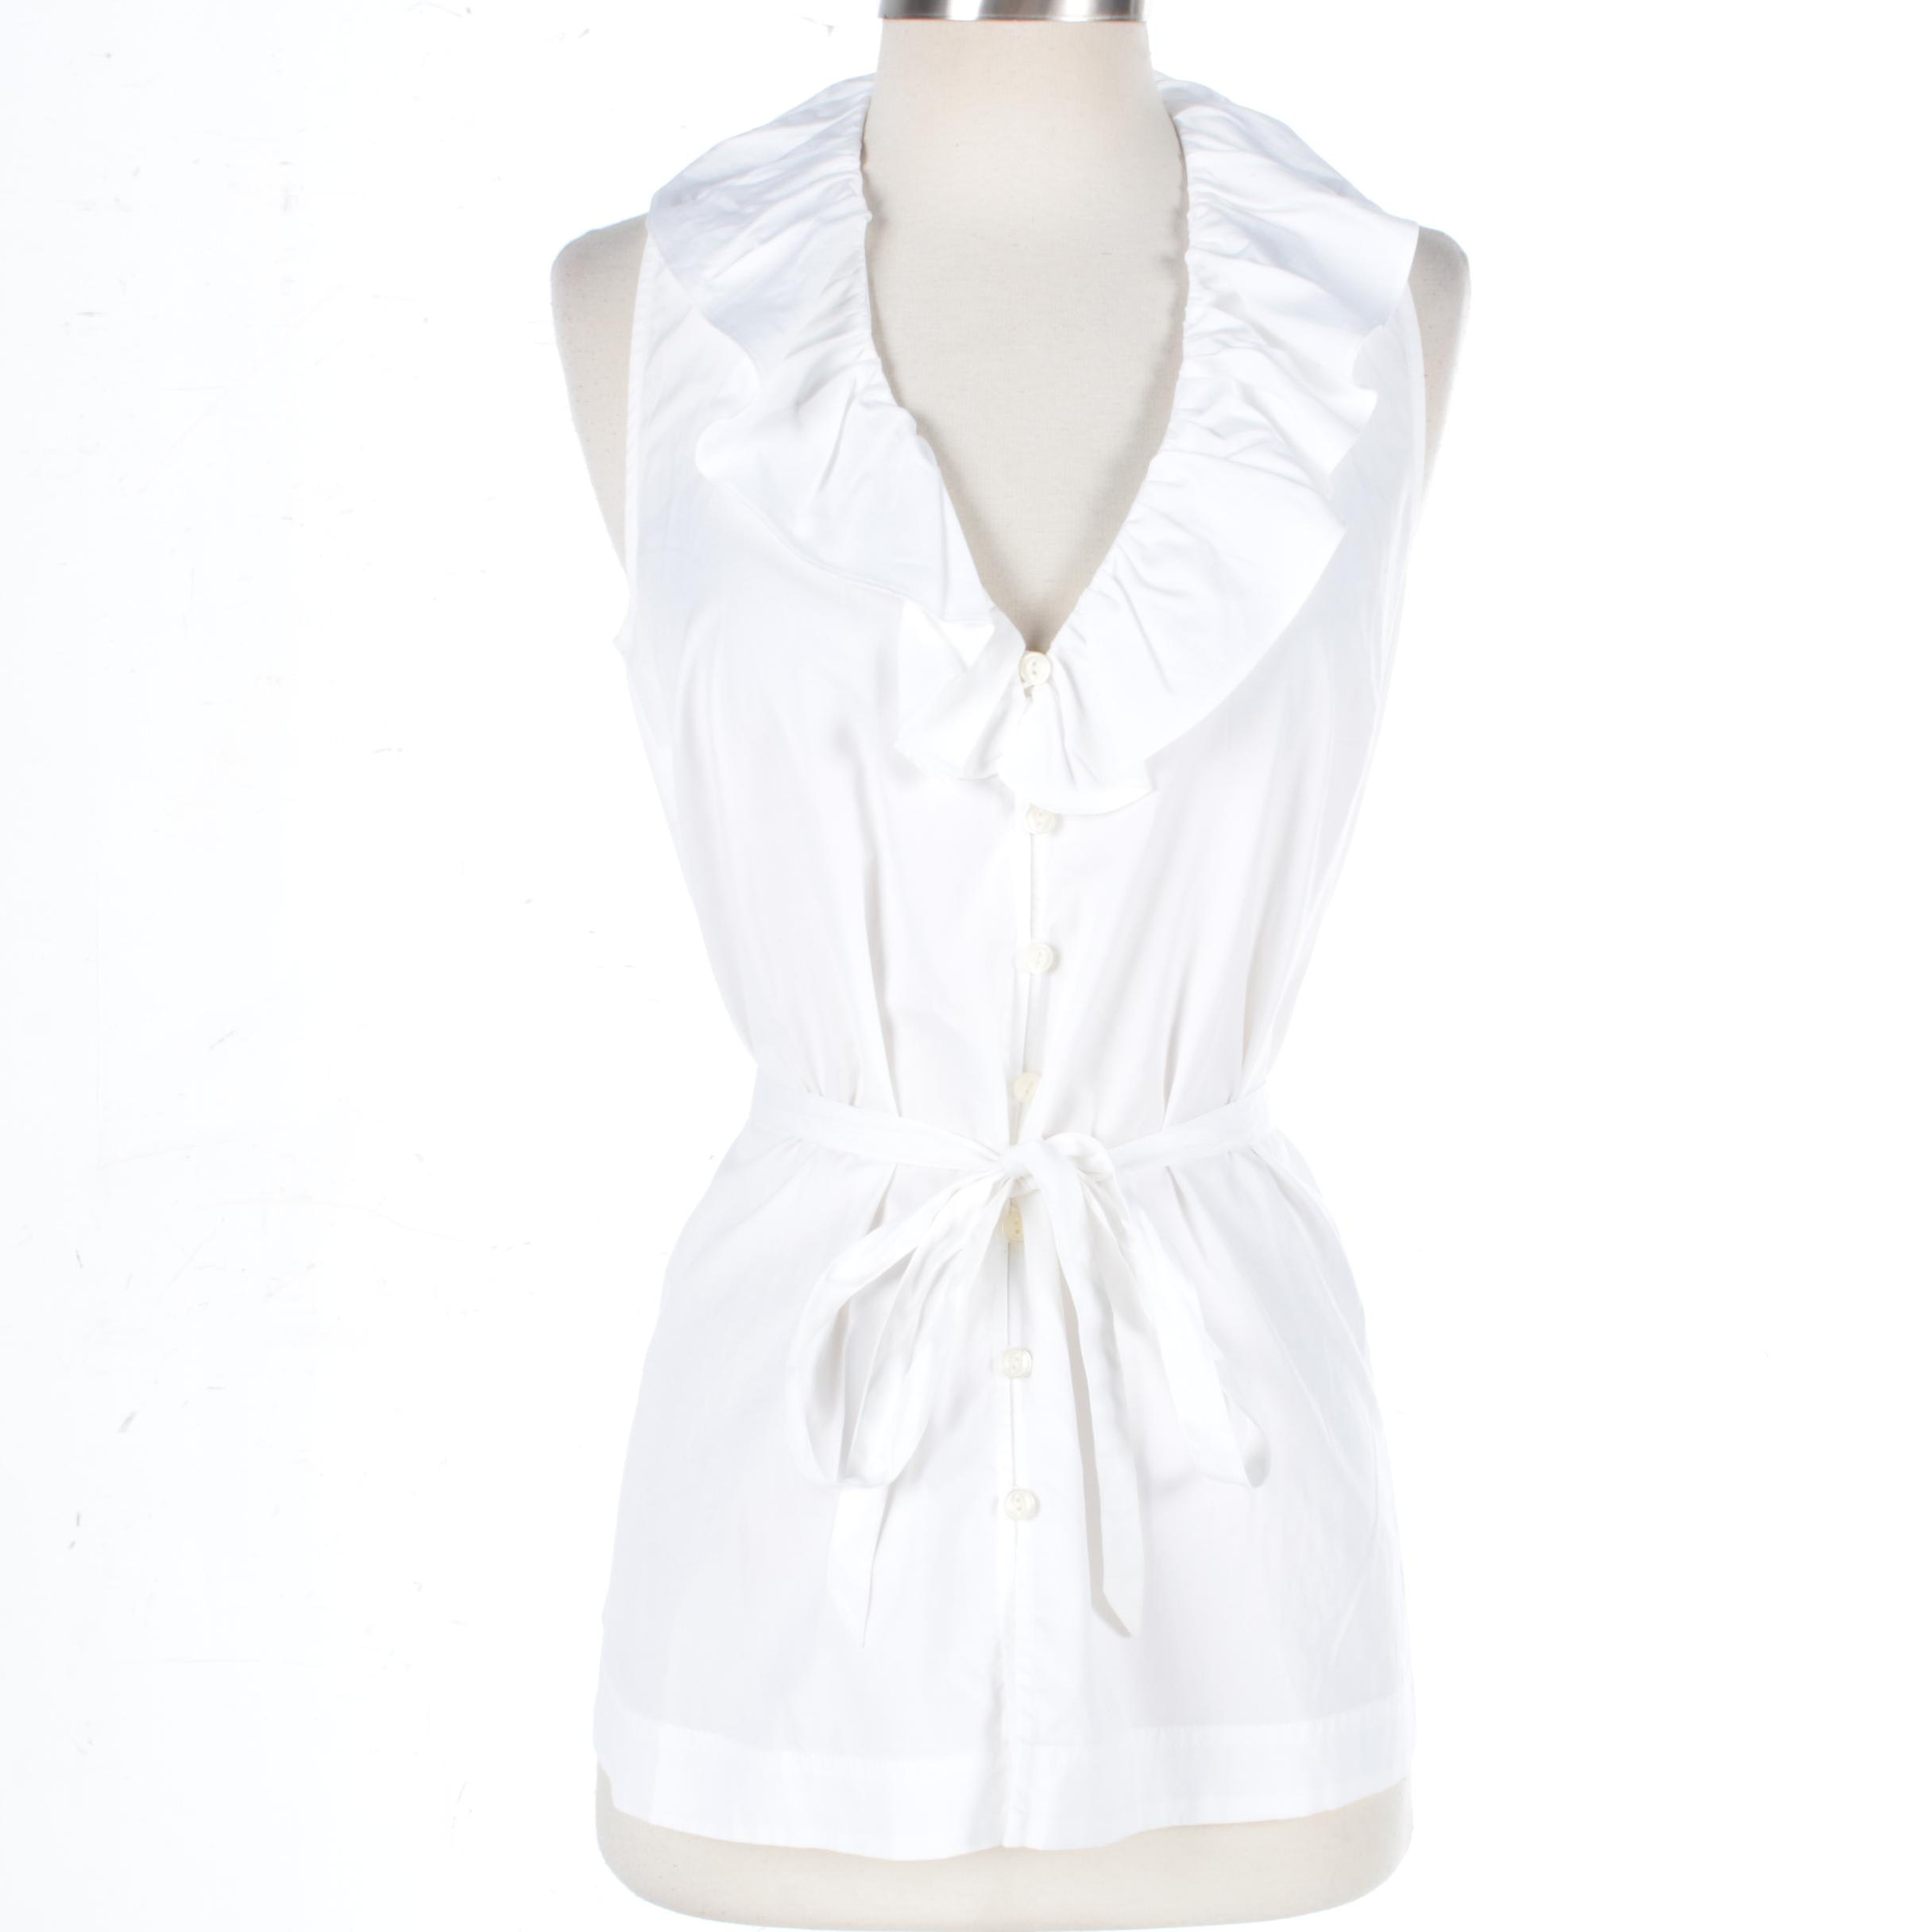 Ralph Lauren Jeans White Cotton Sleeveless Shirt